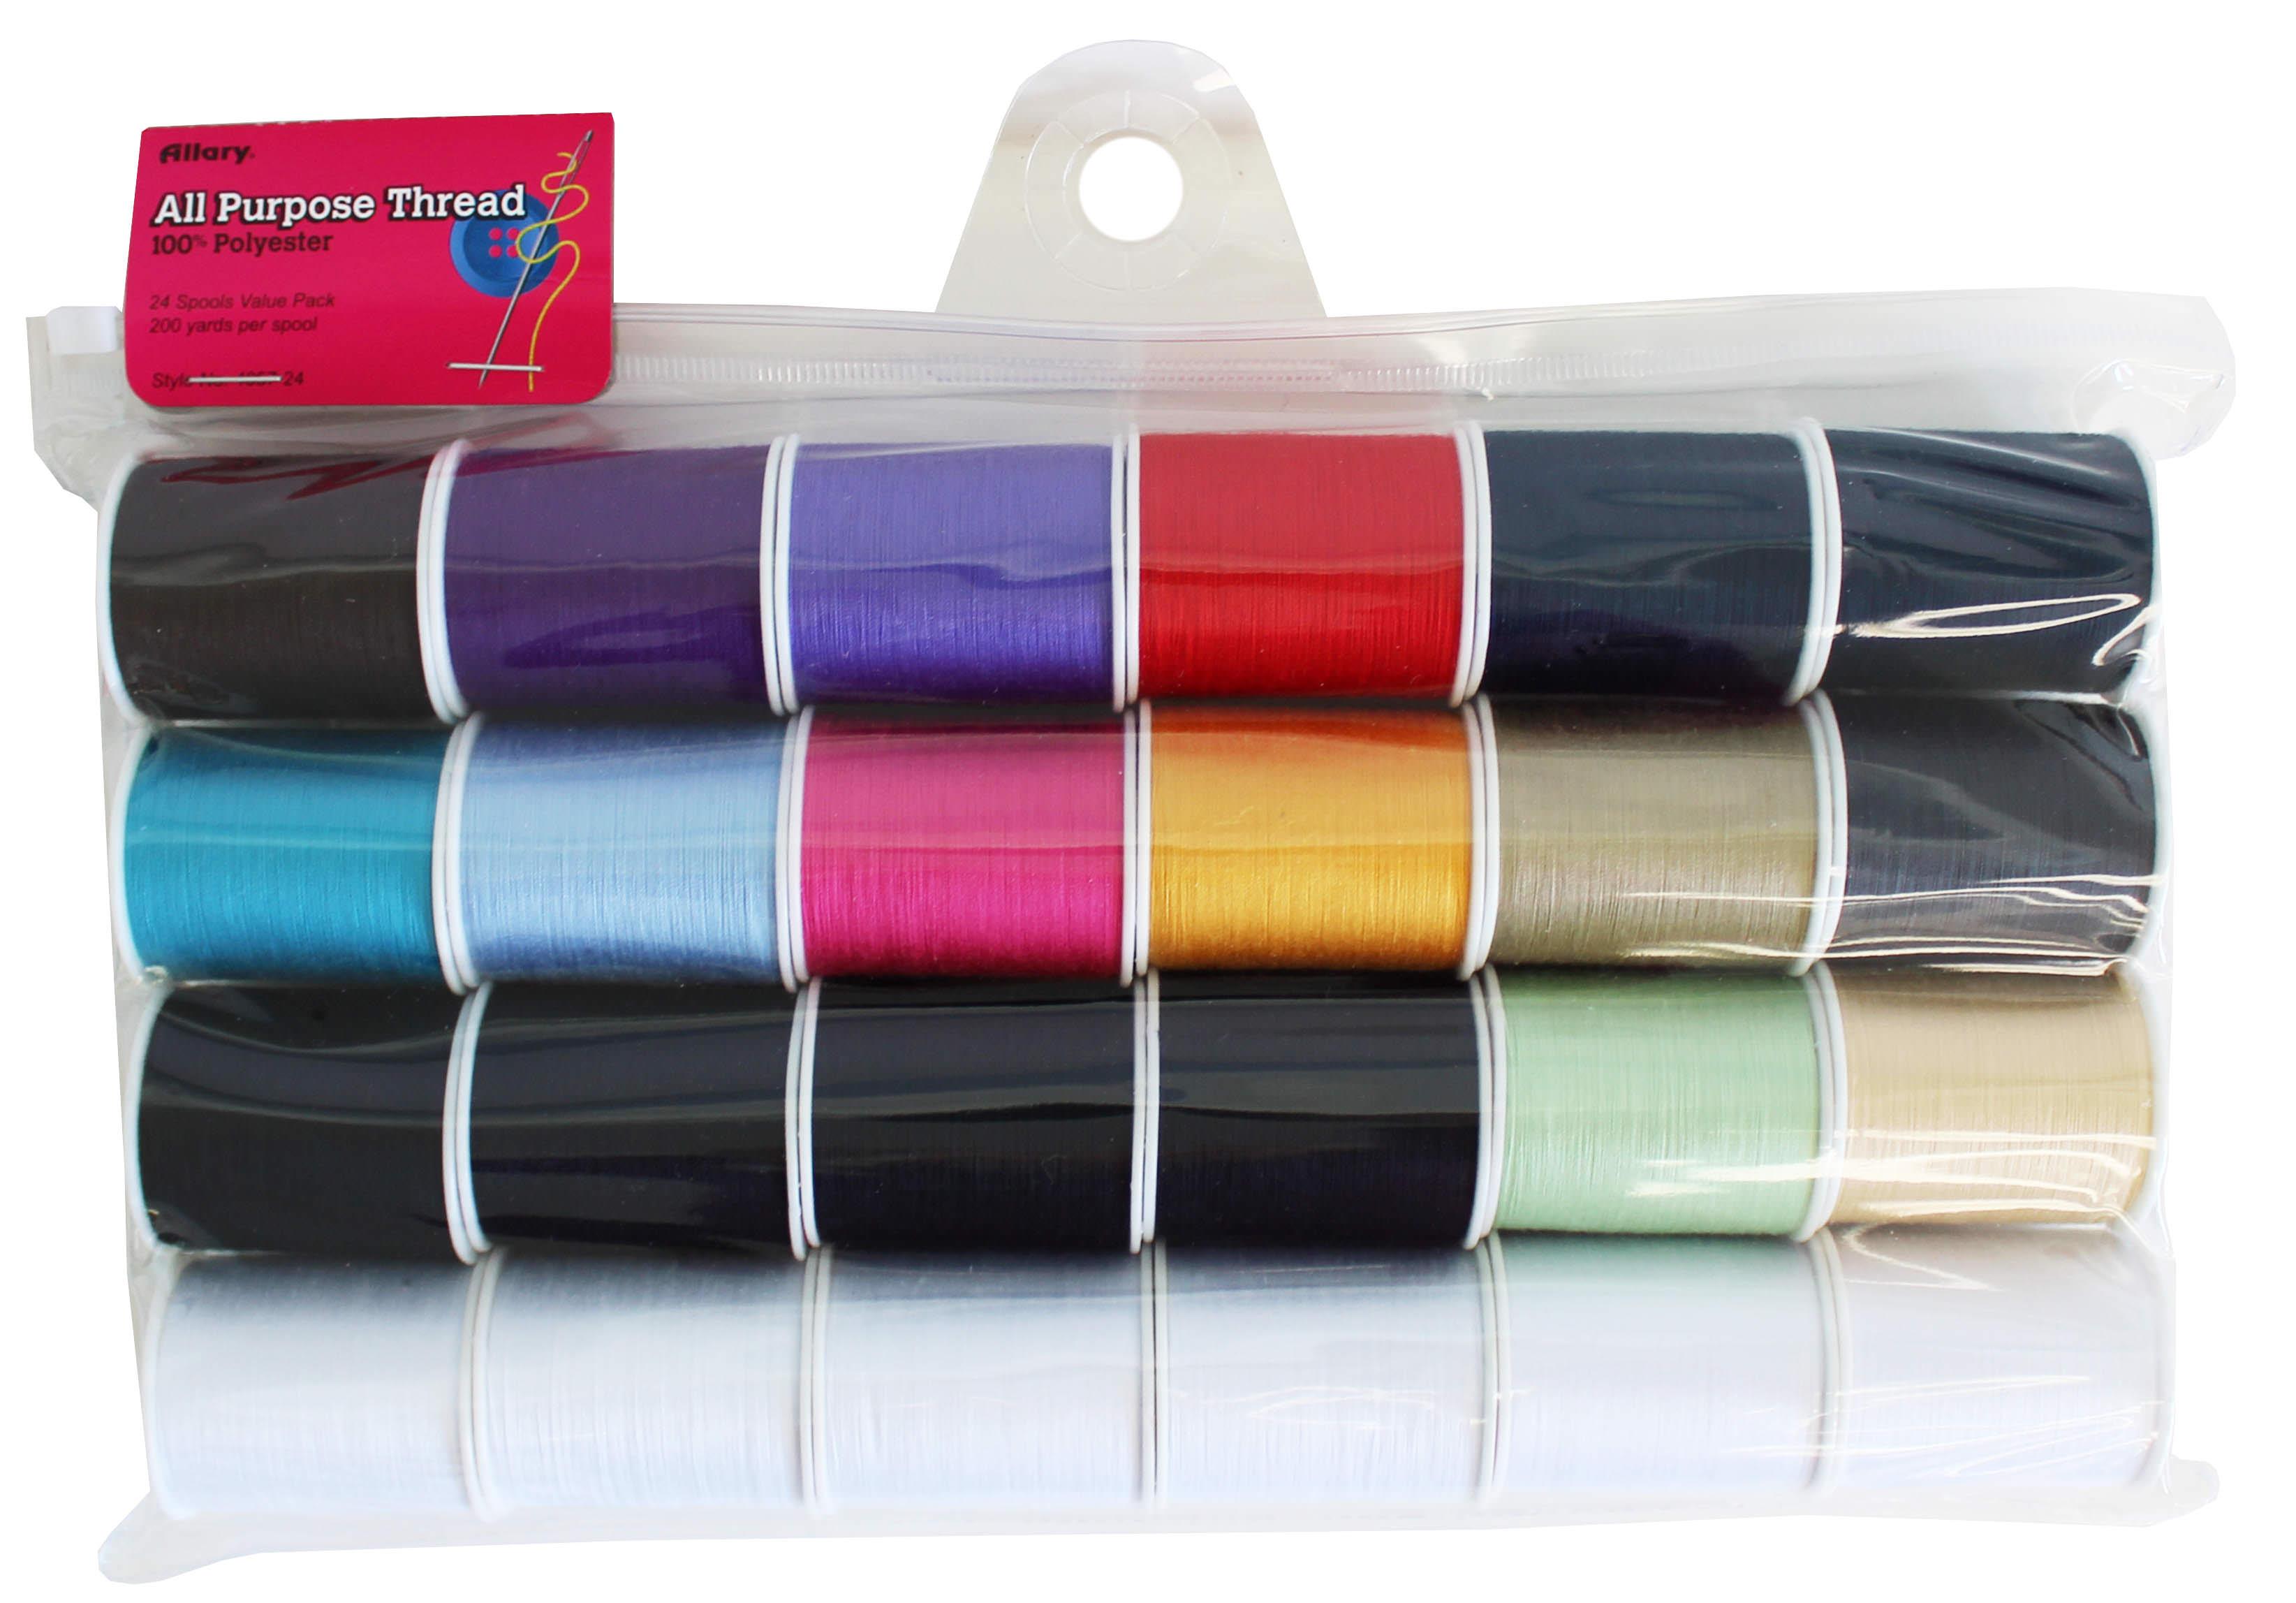 3-Pack Coats /& Clark Bundle: Quilting /& Piecing Cotton Covered Thread 250 Yds Nugrey 1 Artsiga Crafts Seam Ripper S925-0450-3P